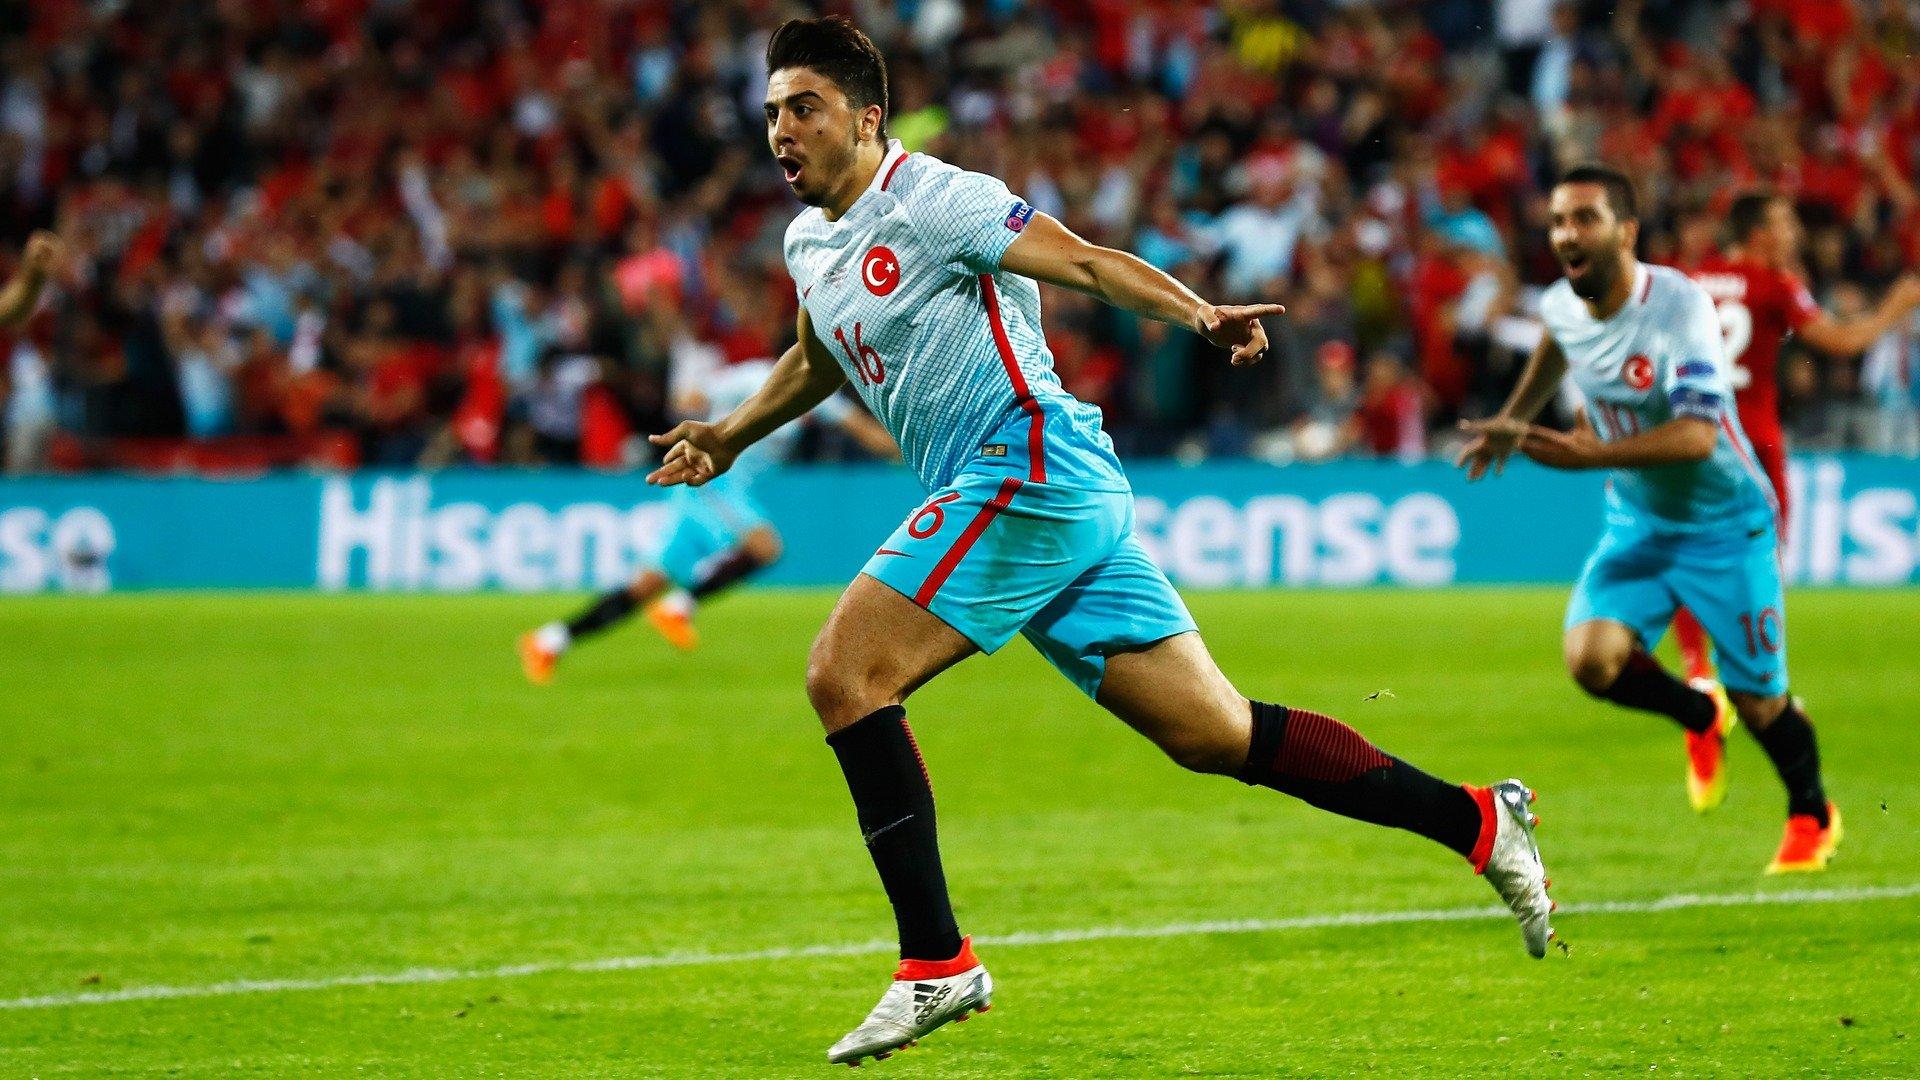 Ozan Tufan'ın FIFA 21 kartı belli oldu